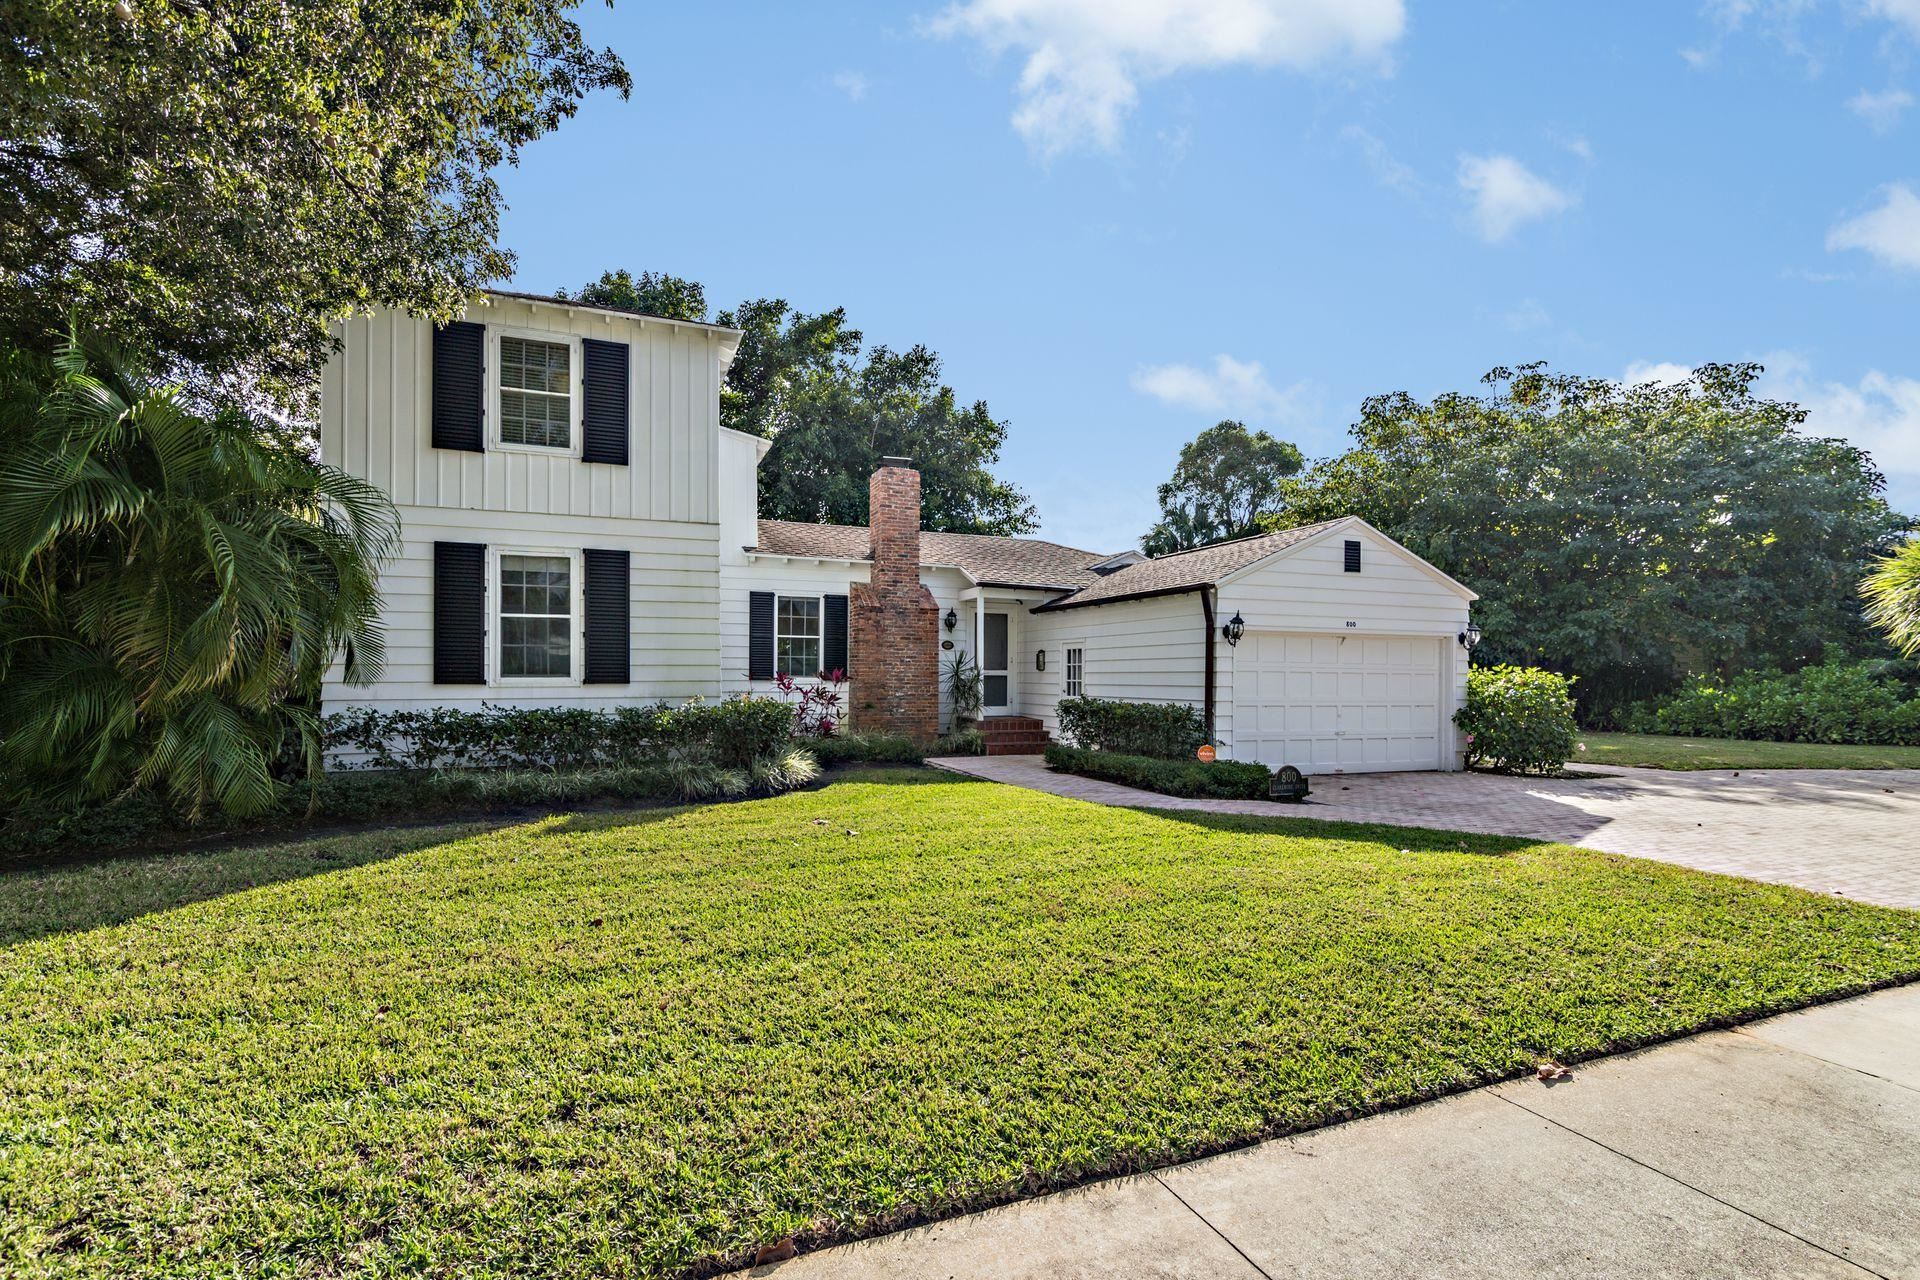 800 Claremore Drive, West Palm Beach, FL 33401 - #: RX-10686337